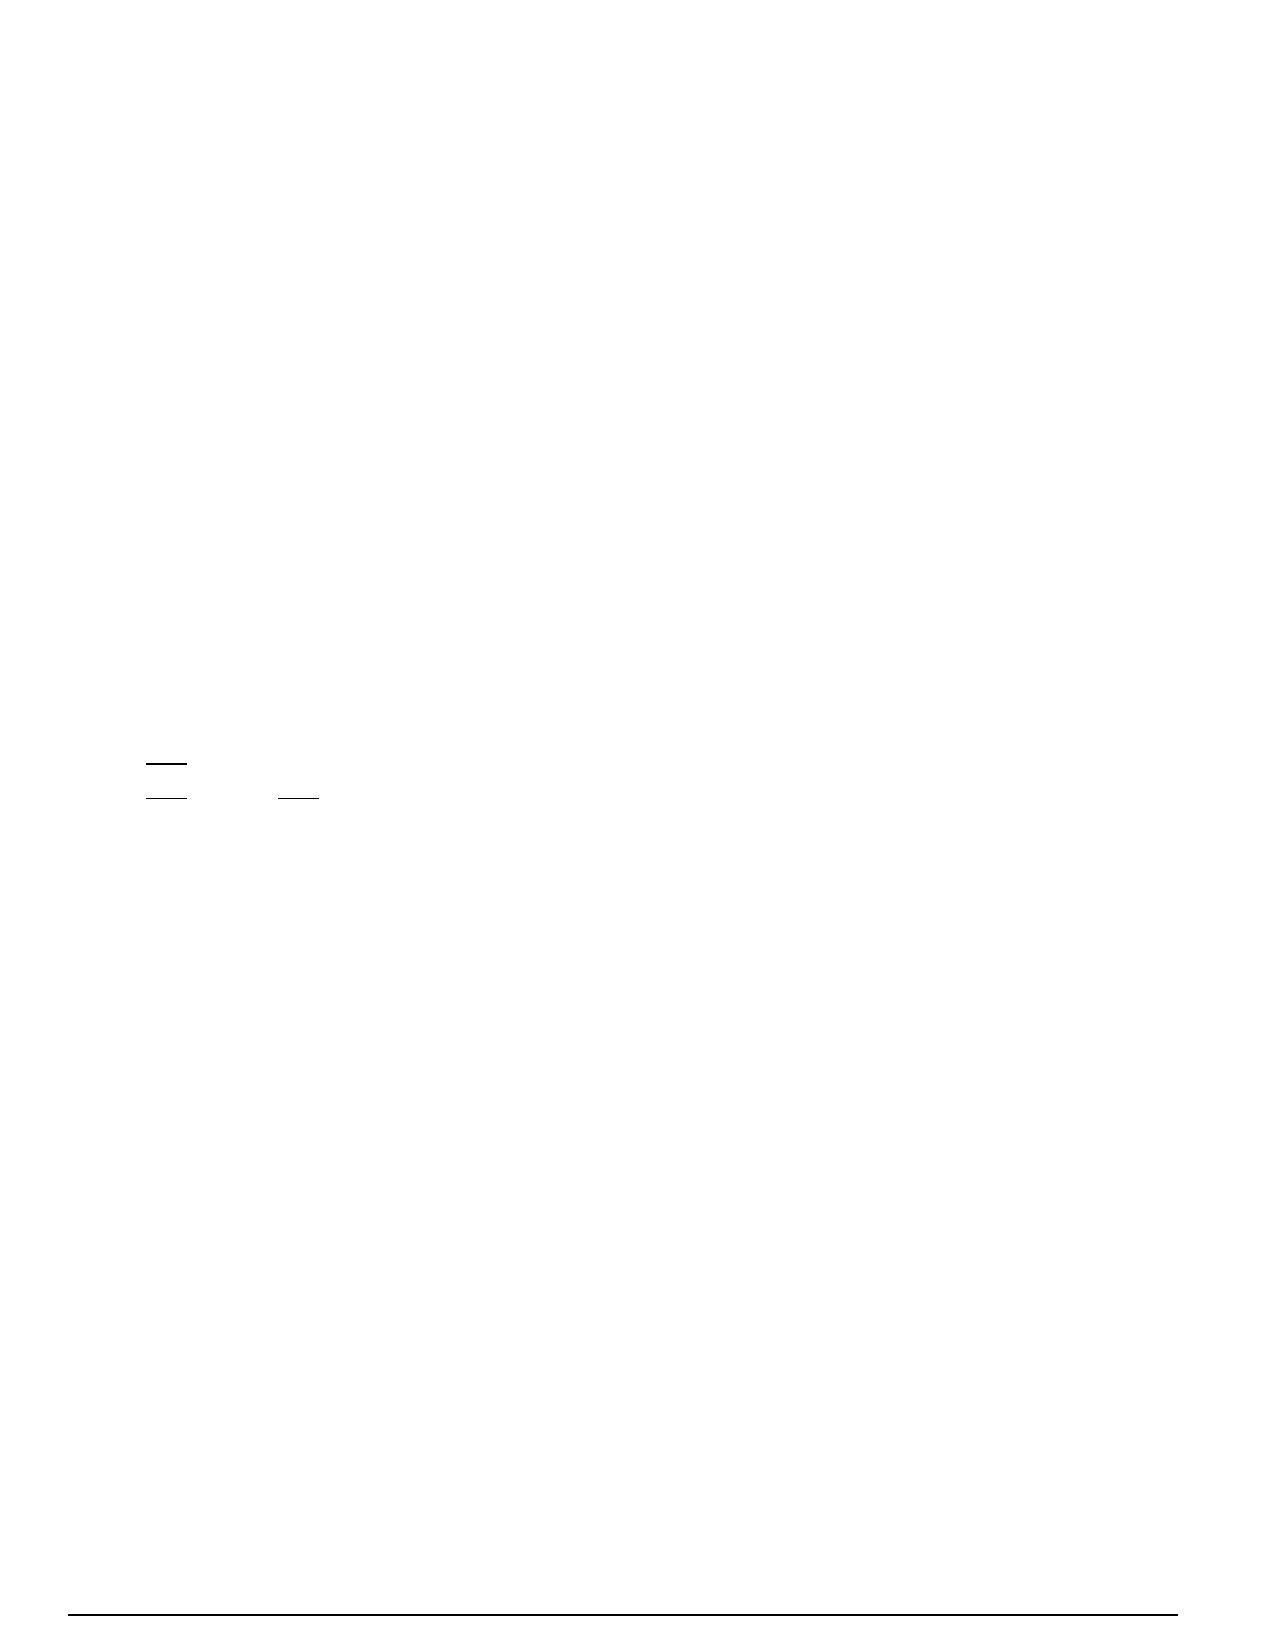 AD402M188RSA-5 Даташит, Описание, Даташиты